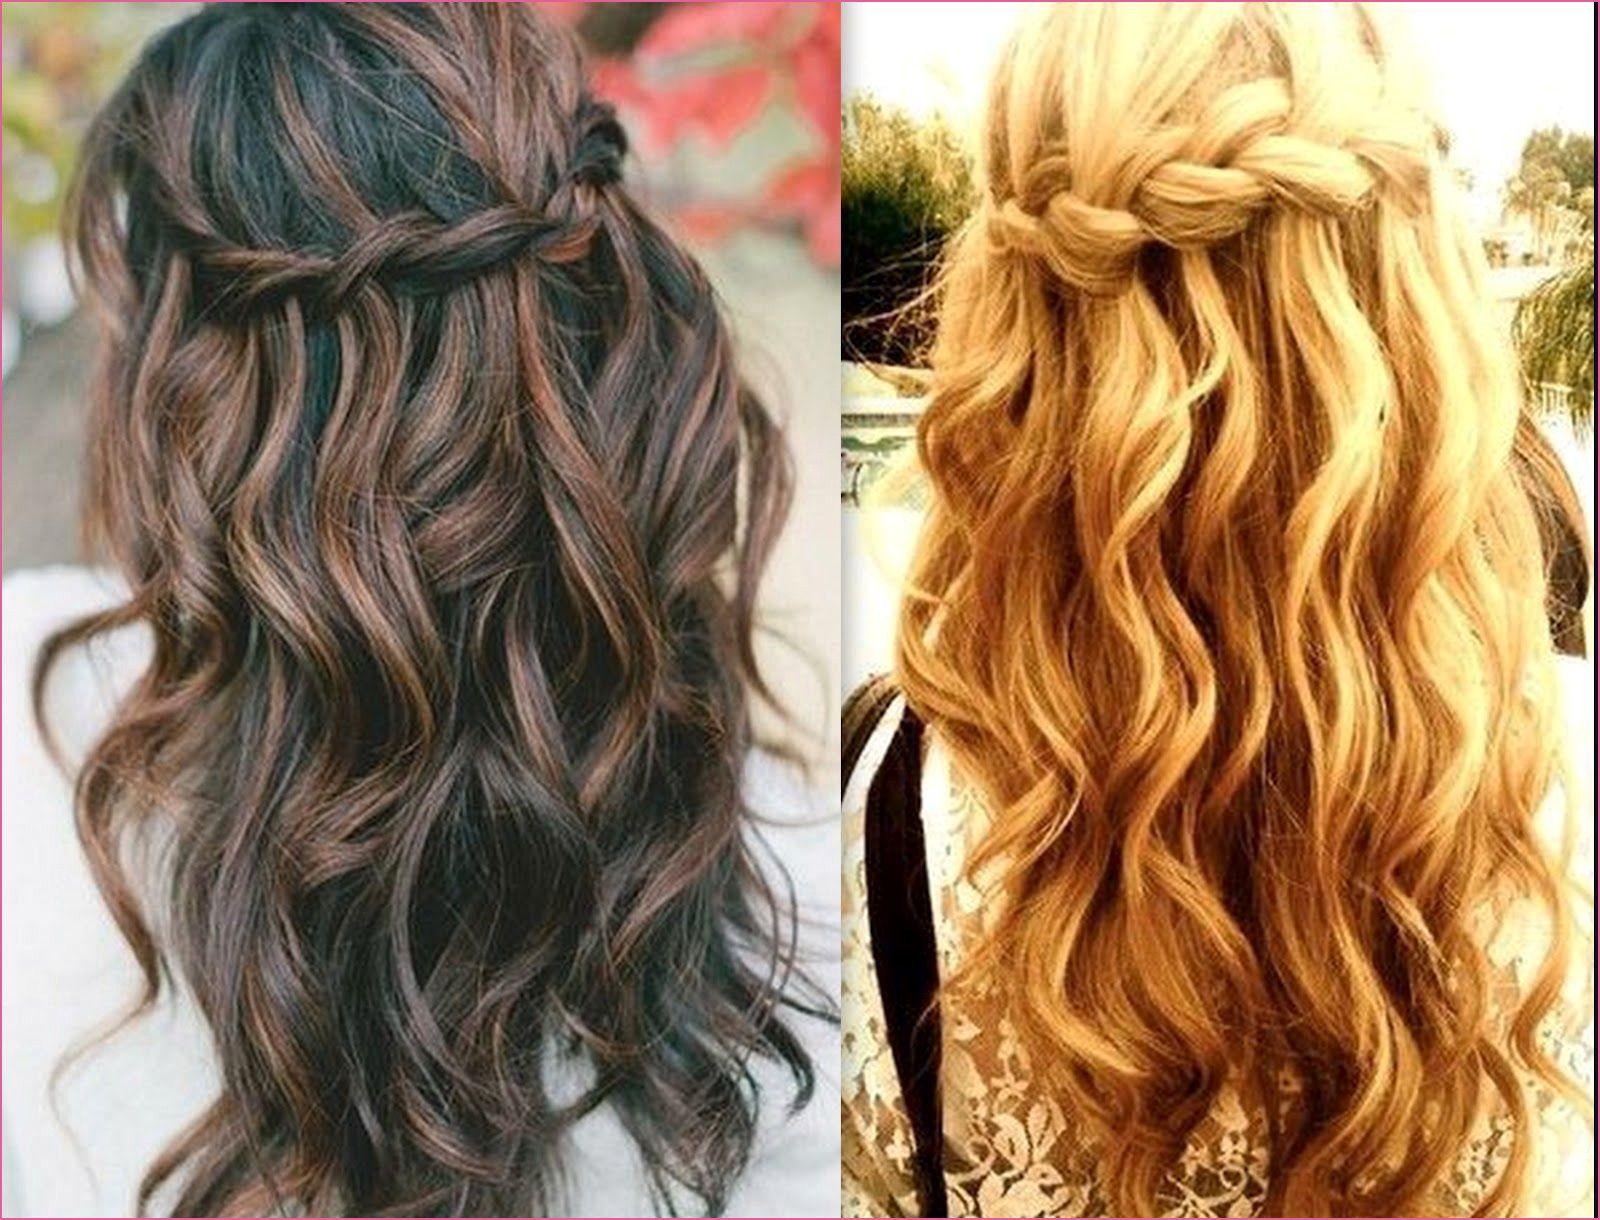 Fein Konfirmation Frisuren Hochgesteckt Frisuren Offene Haare Frisuren Lange Haare Abschlussball Hochzeitsfrisuren Offene Haare